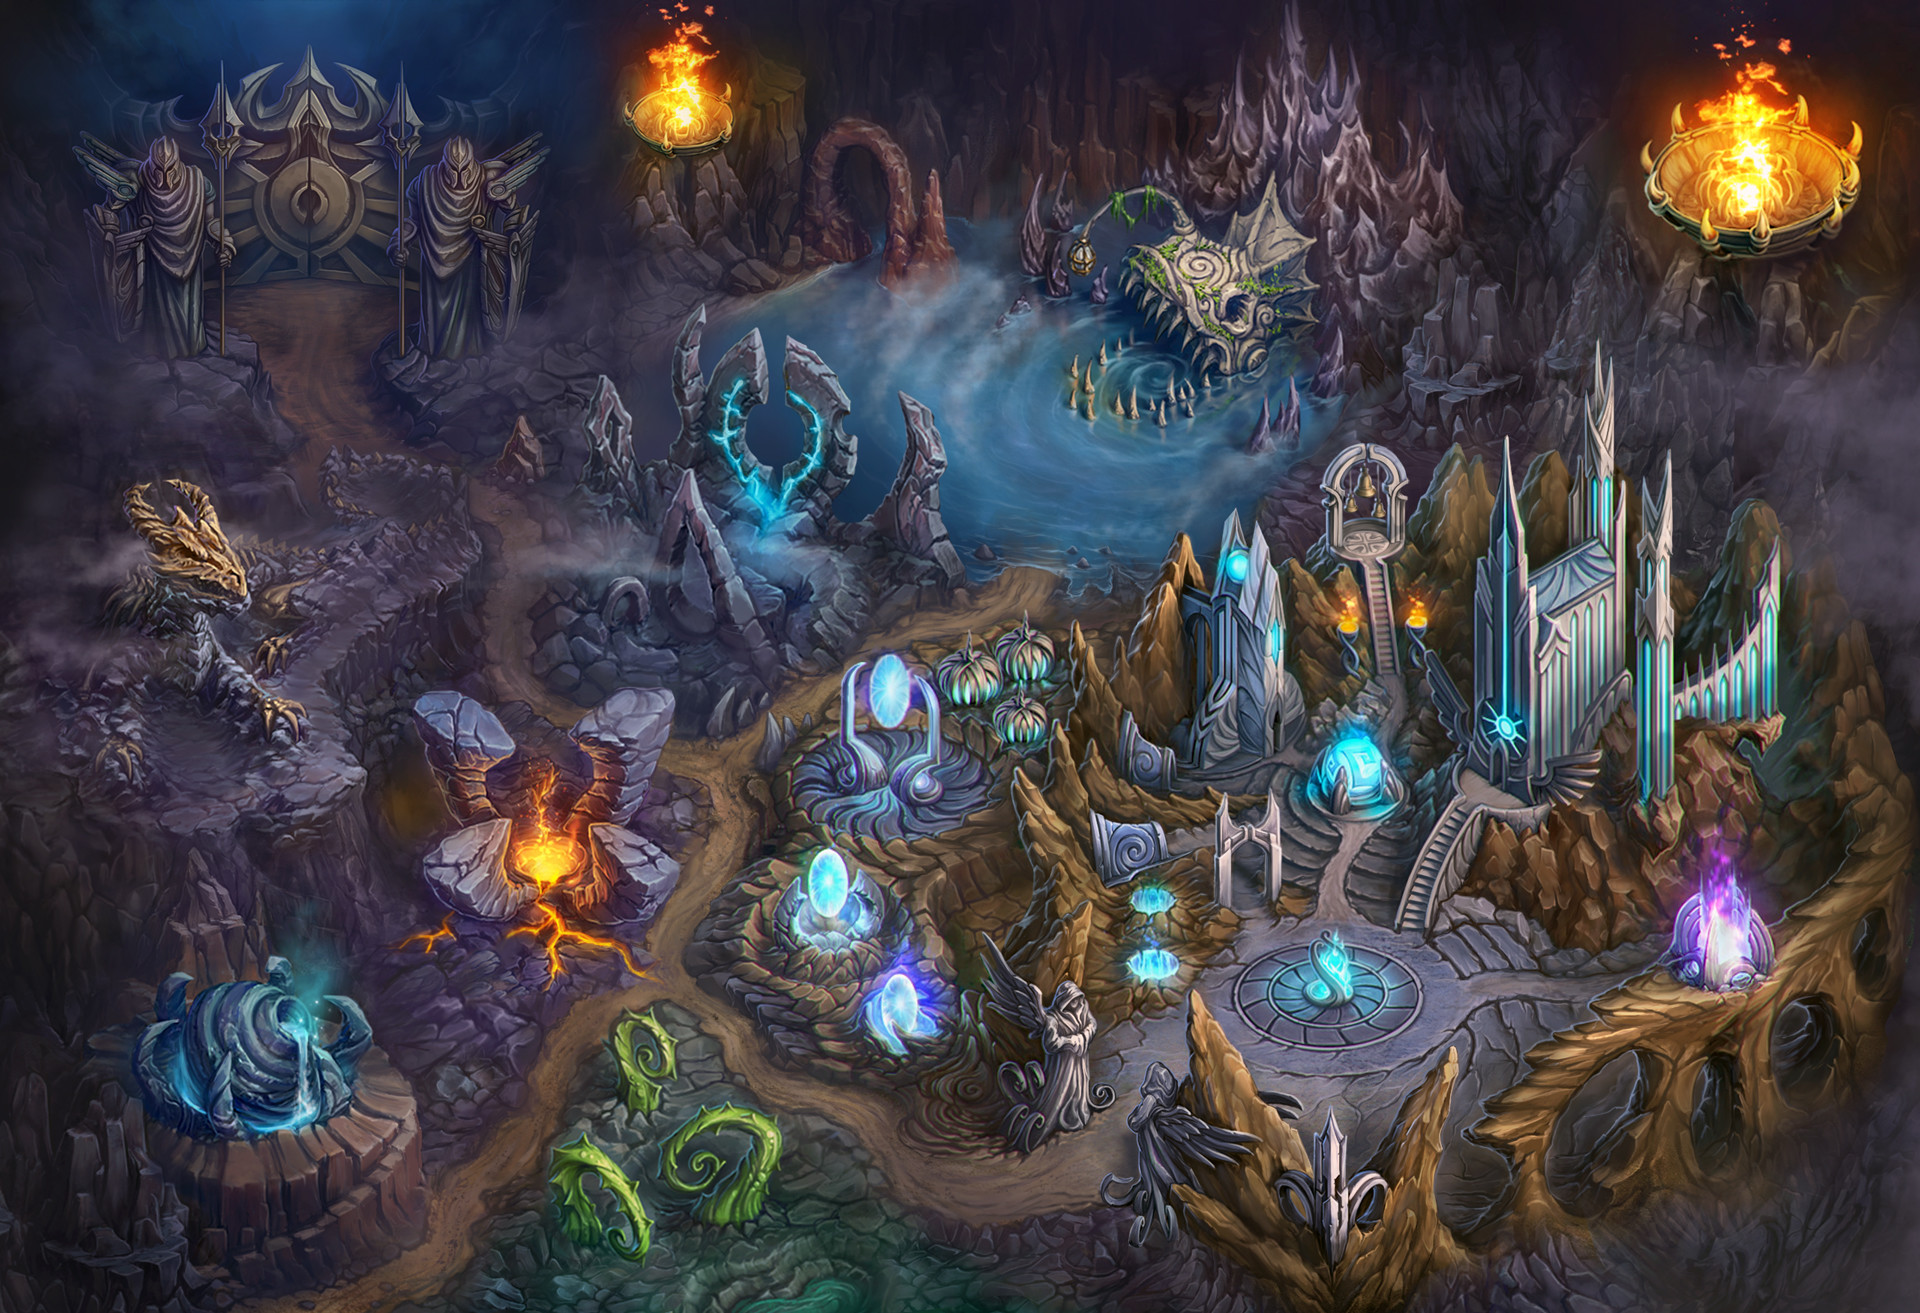 ArtStation - Map of the magical world, Alex Yunak